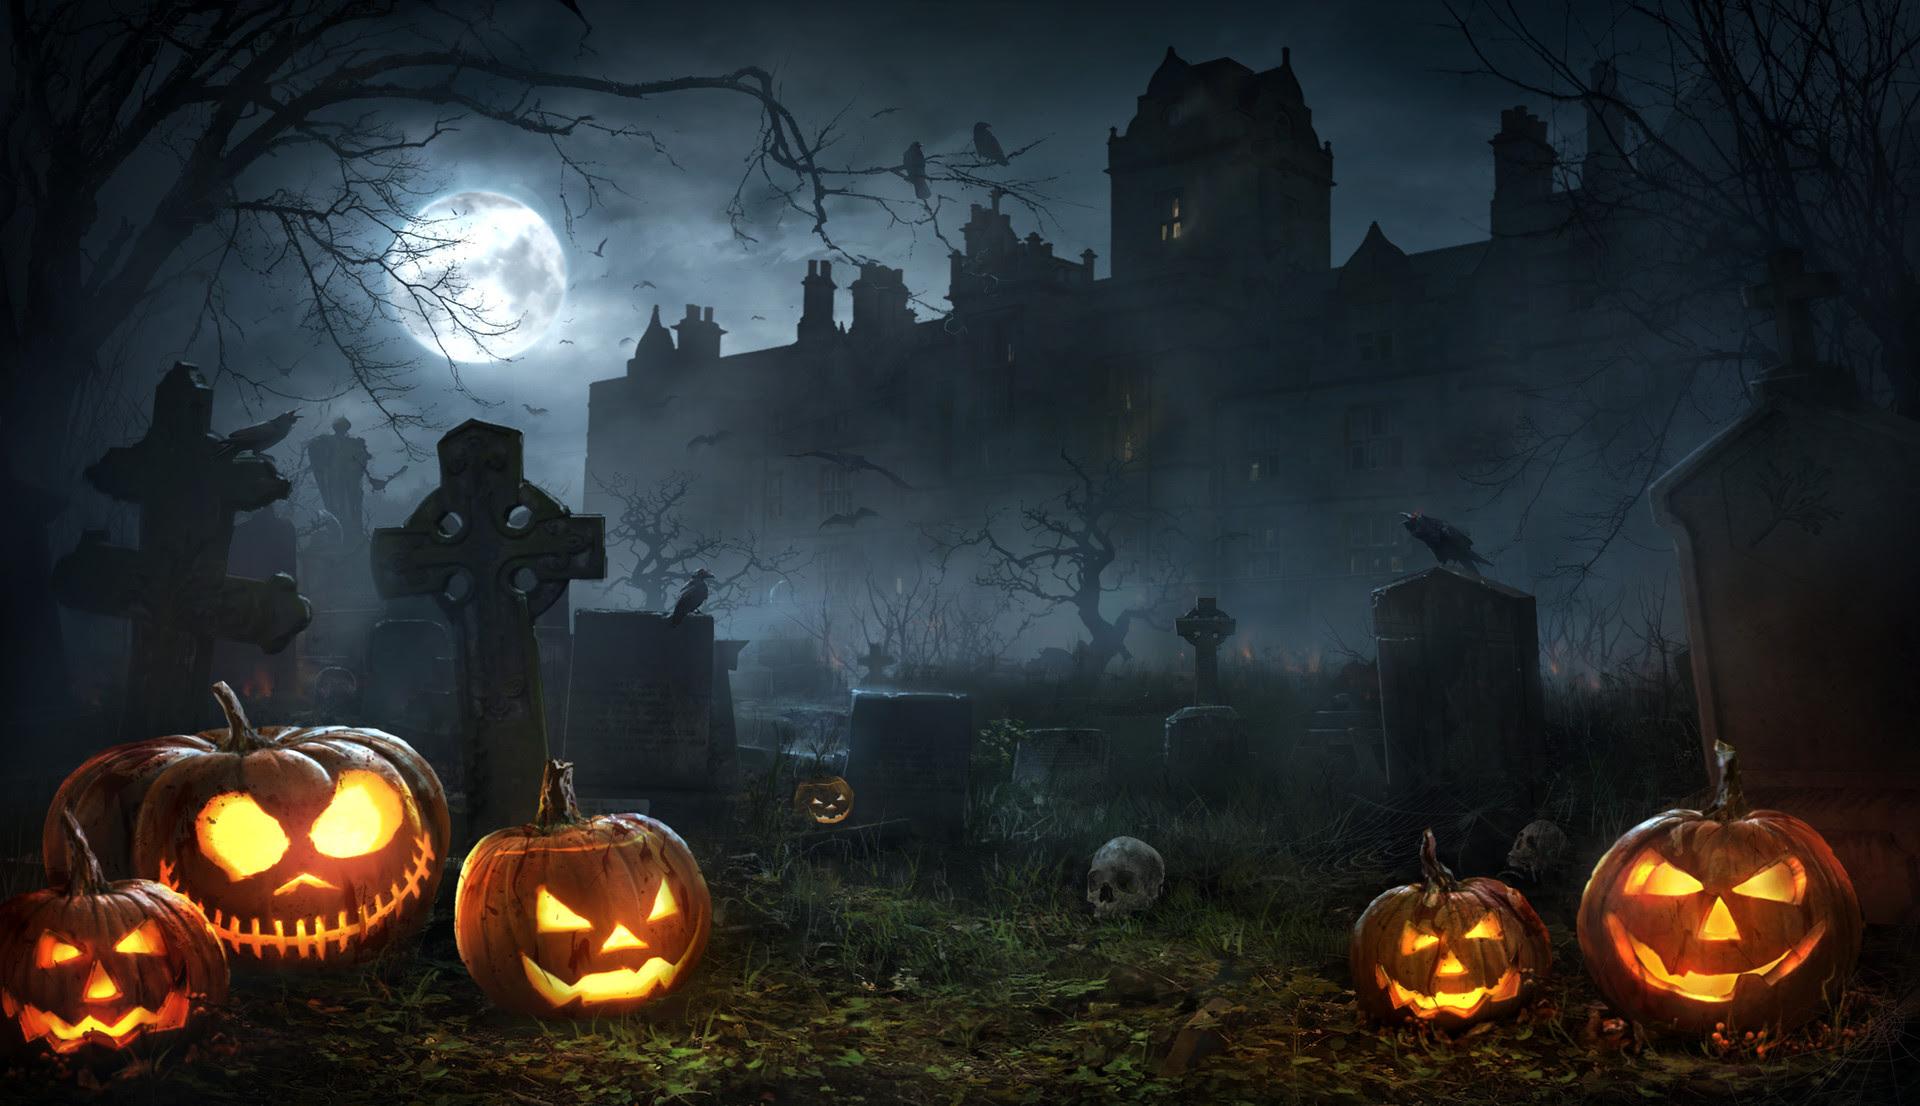 3004032 1920x1106 Cemetery Graveyard Halloween Holiday Jack O